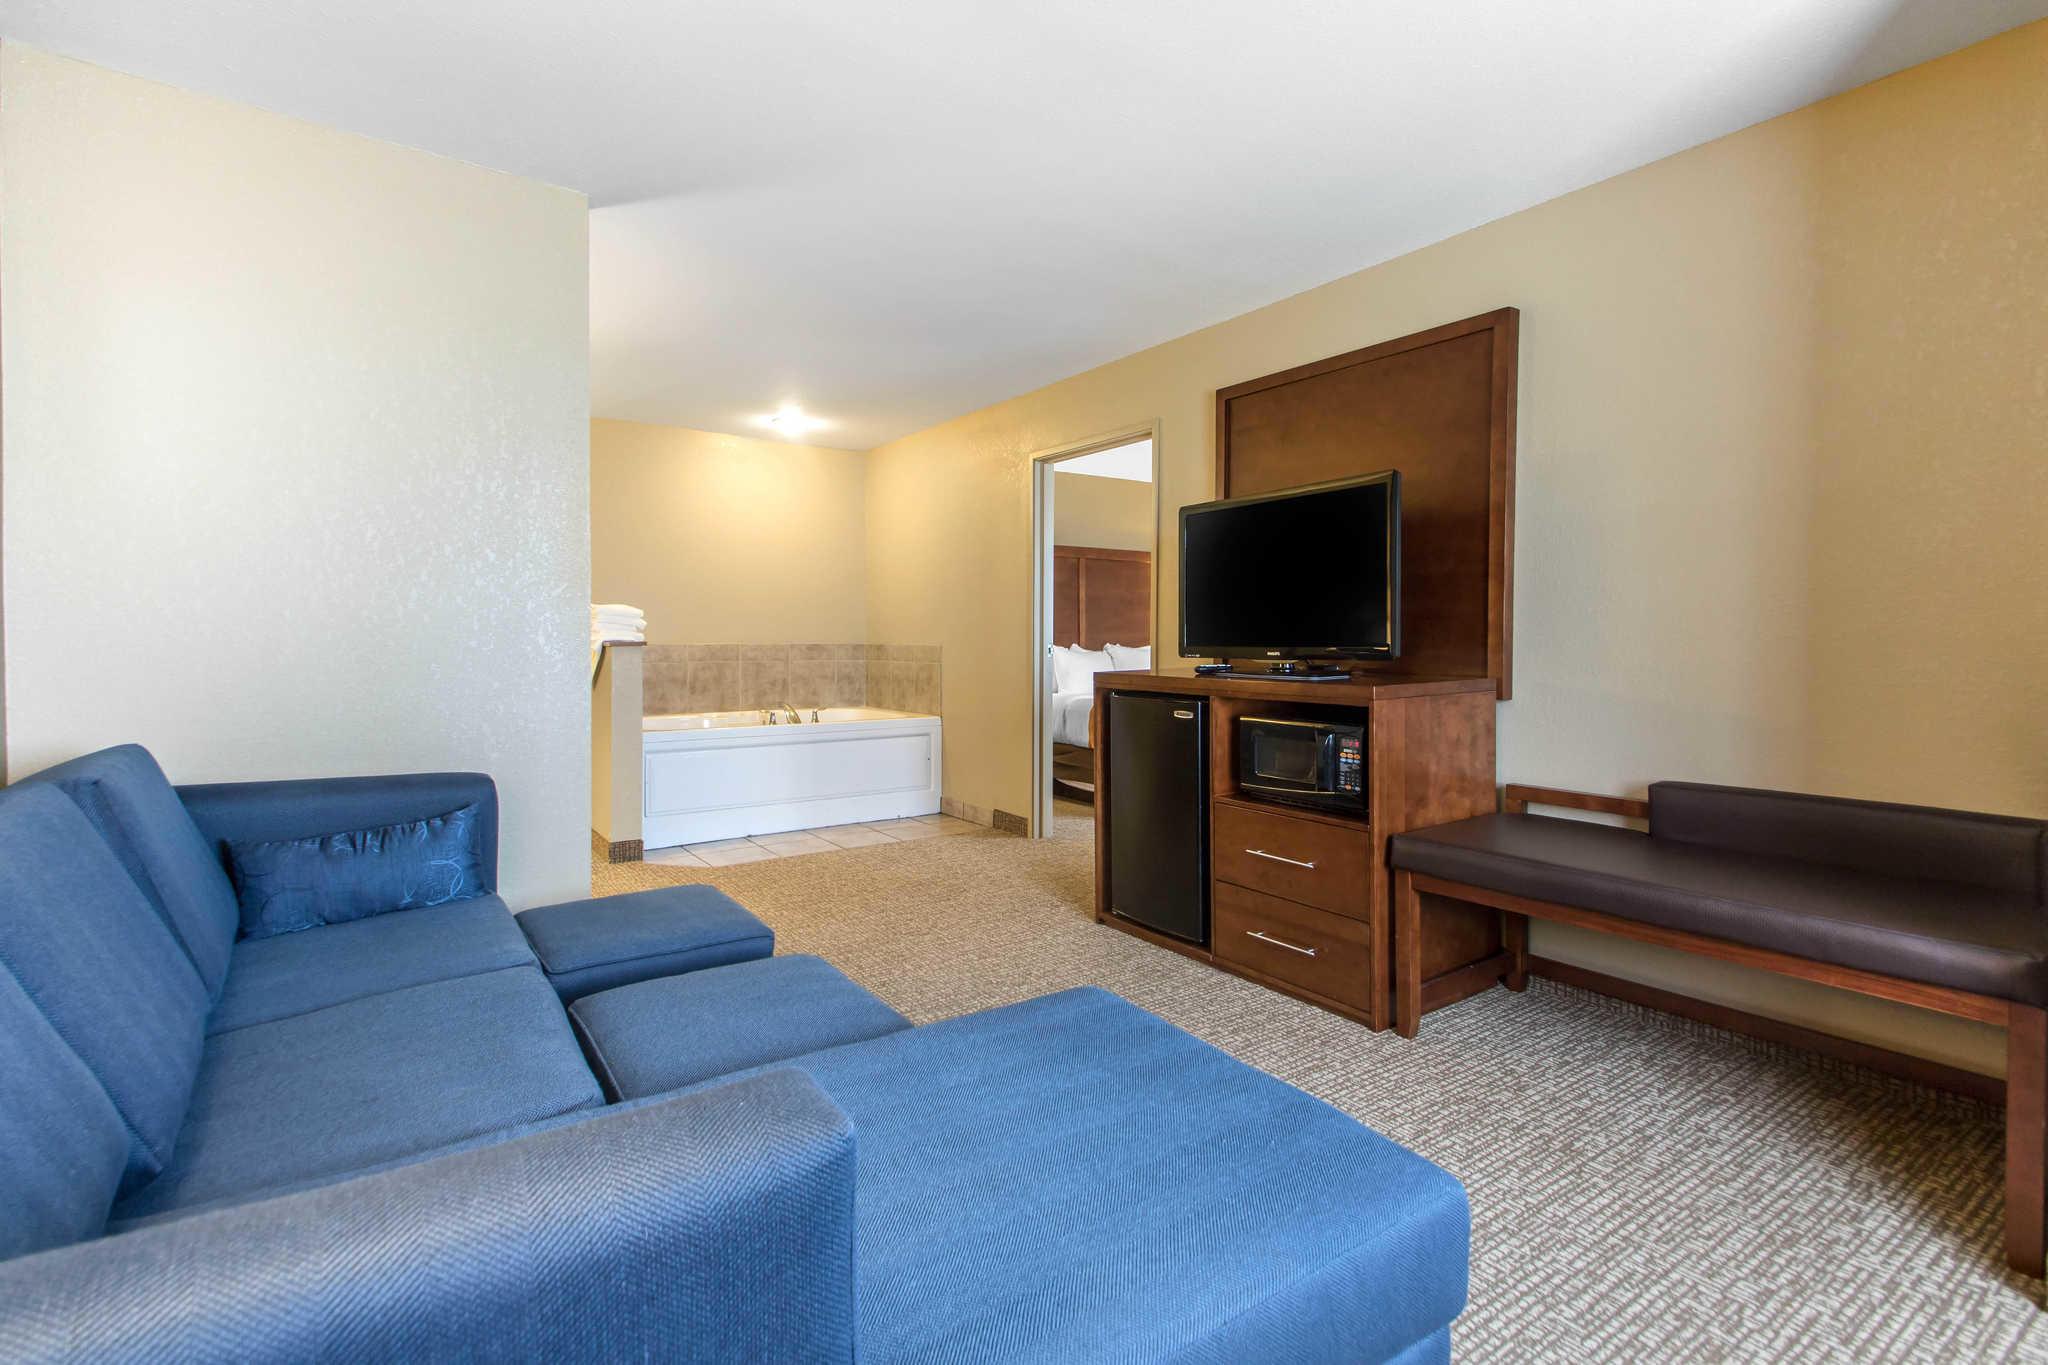 Comfort Suites Johnson Creek Conference Center image 14